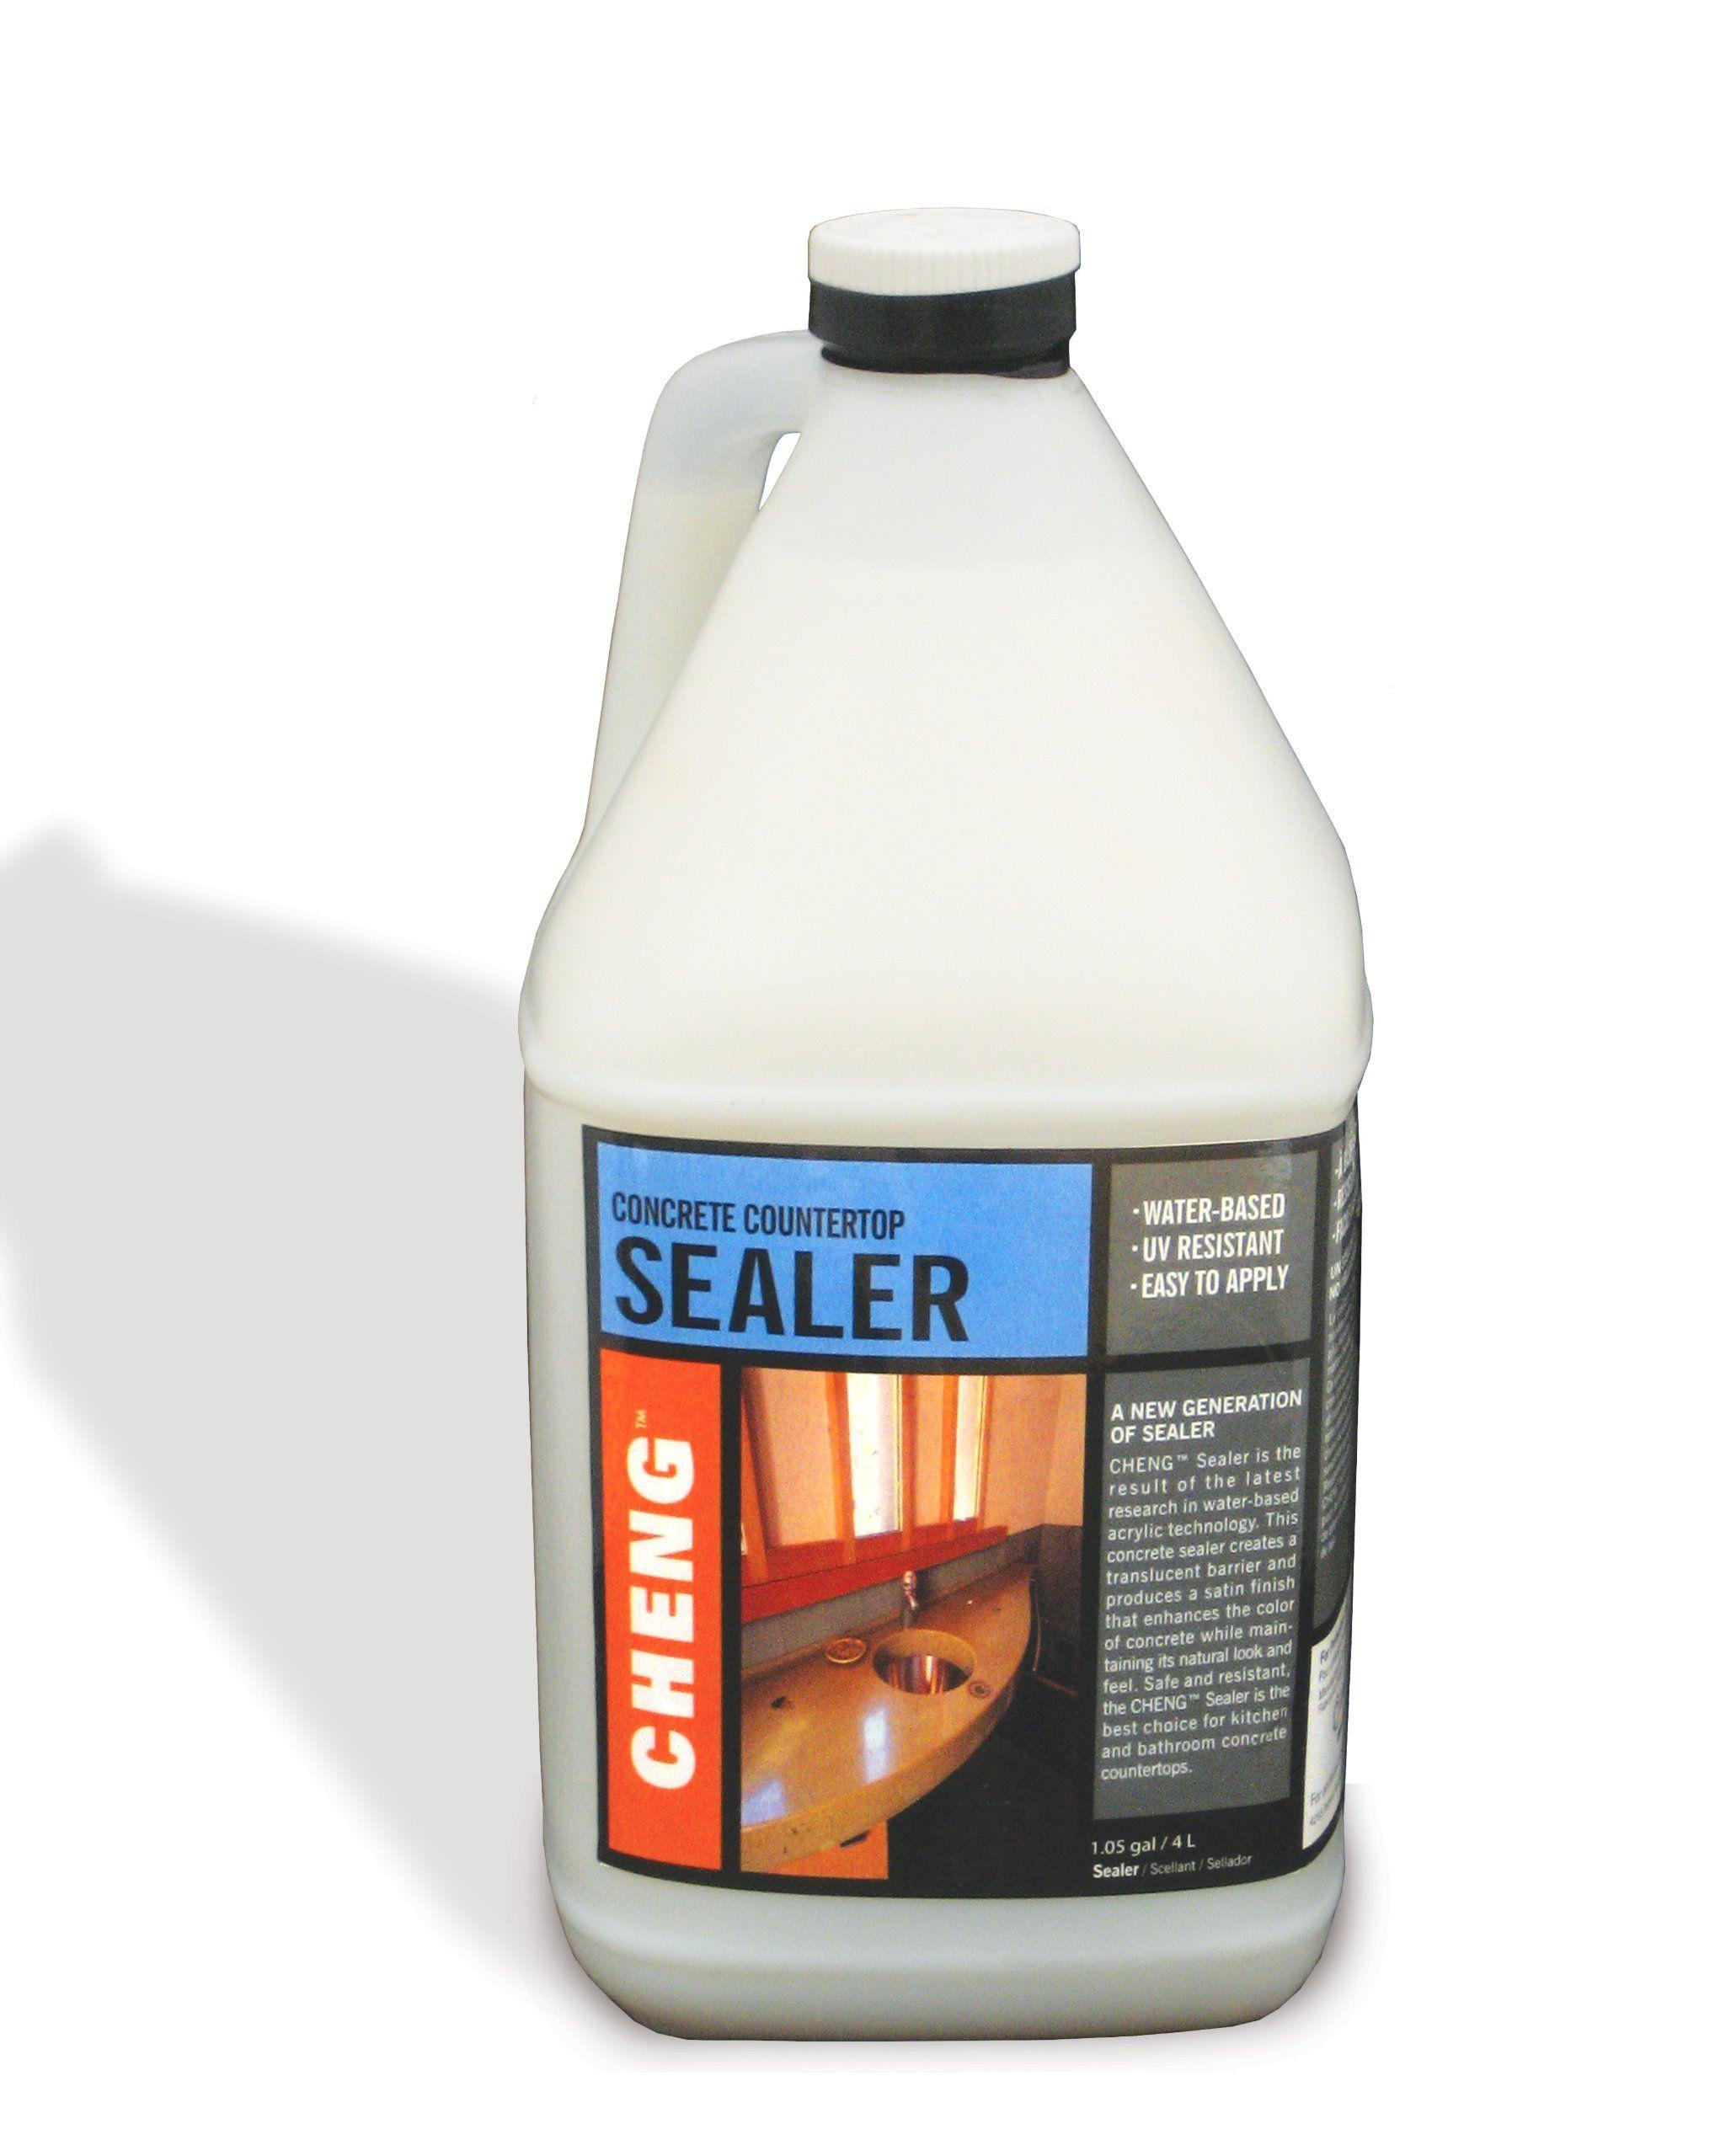 Food Safe Concrete Countertop Sealer   4L   Hardware Sealers   Amazon.com